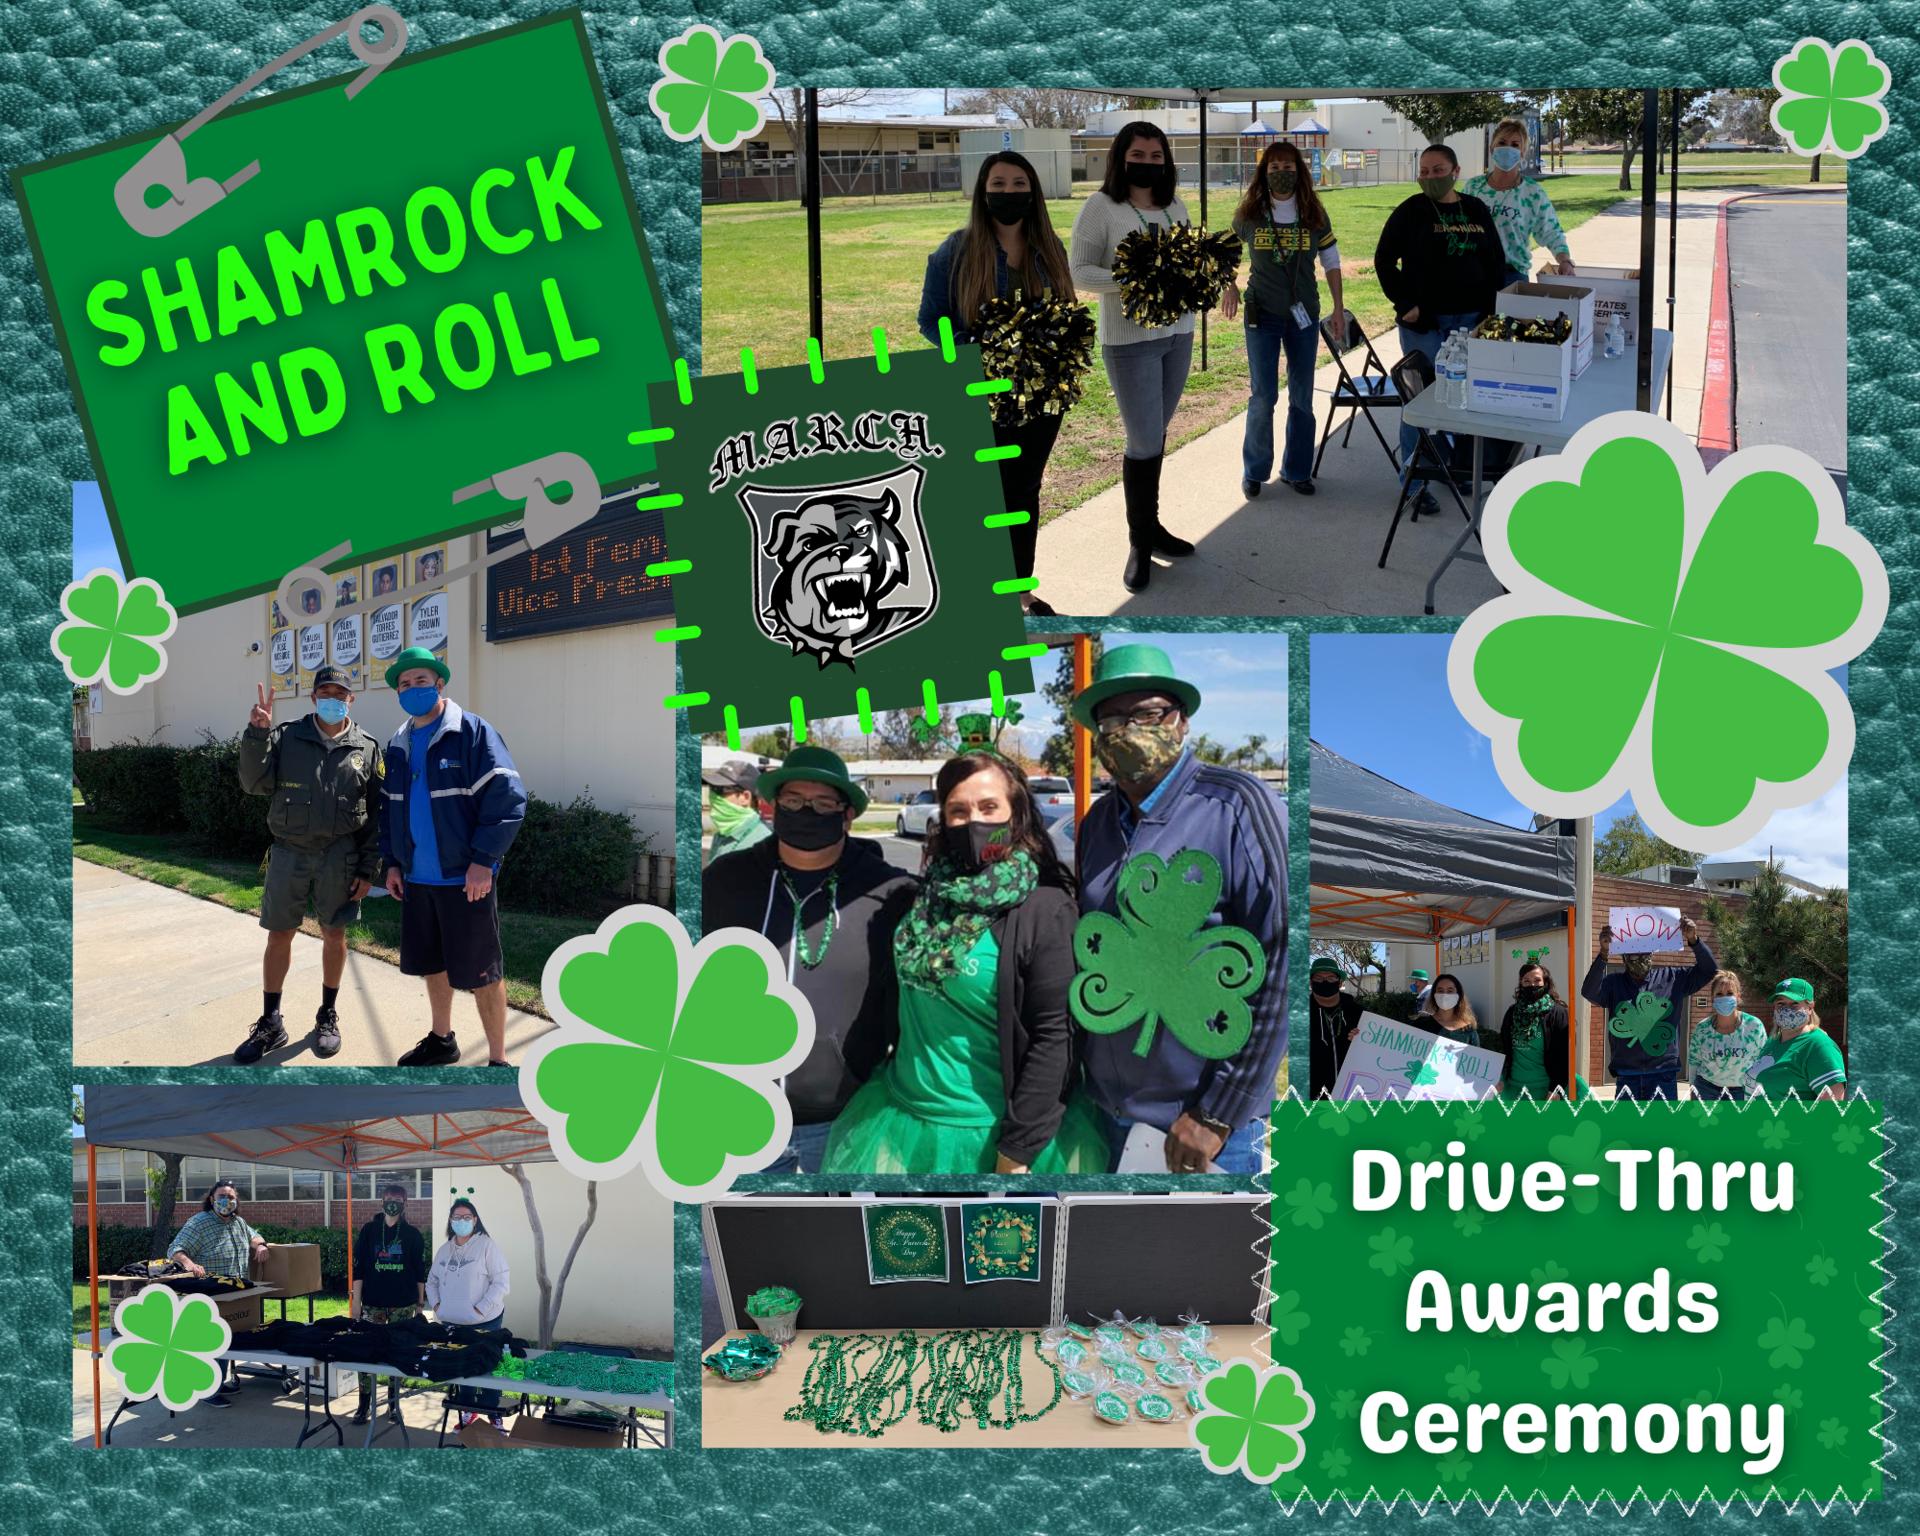 Shamrock and Roll Drive-Thru Awards